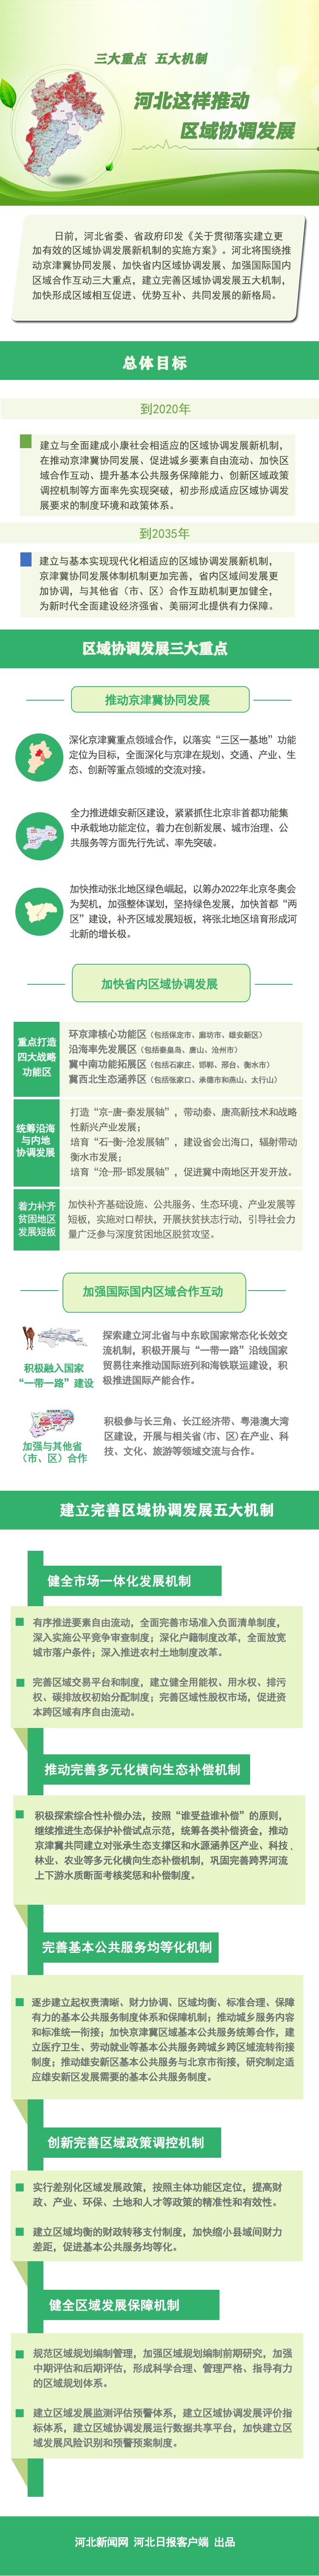 http://www.bdxyx.com/baodingxinwen/35658.html